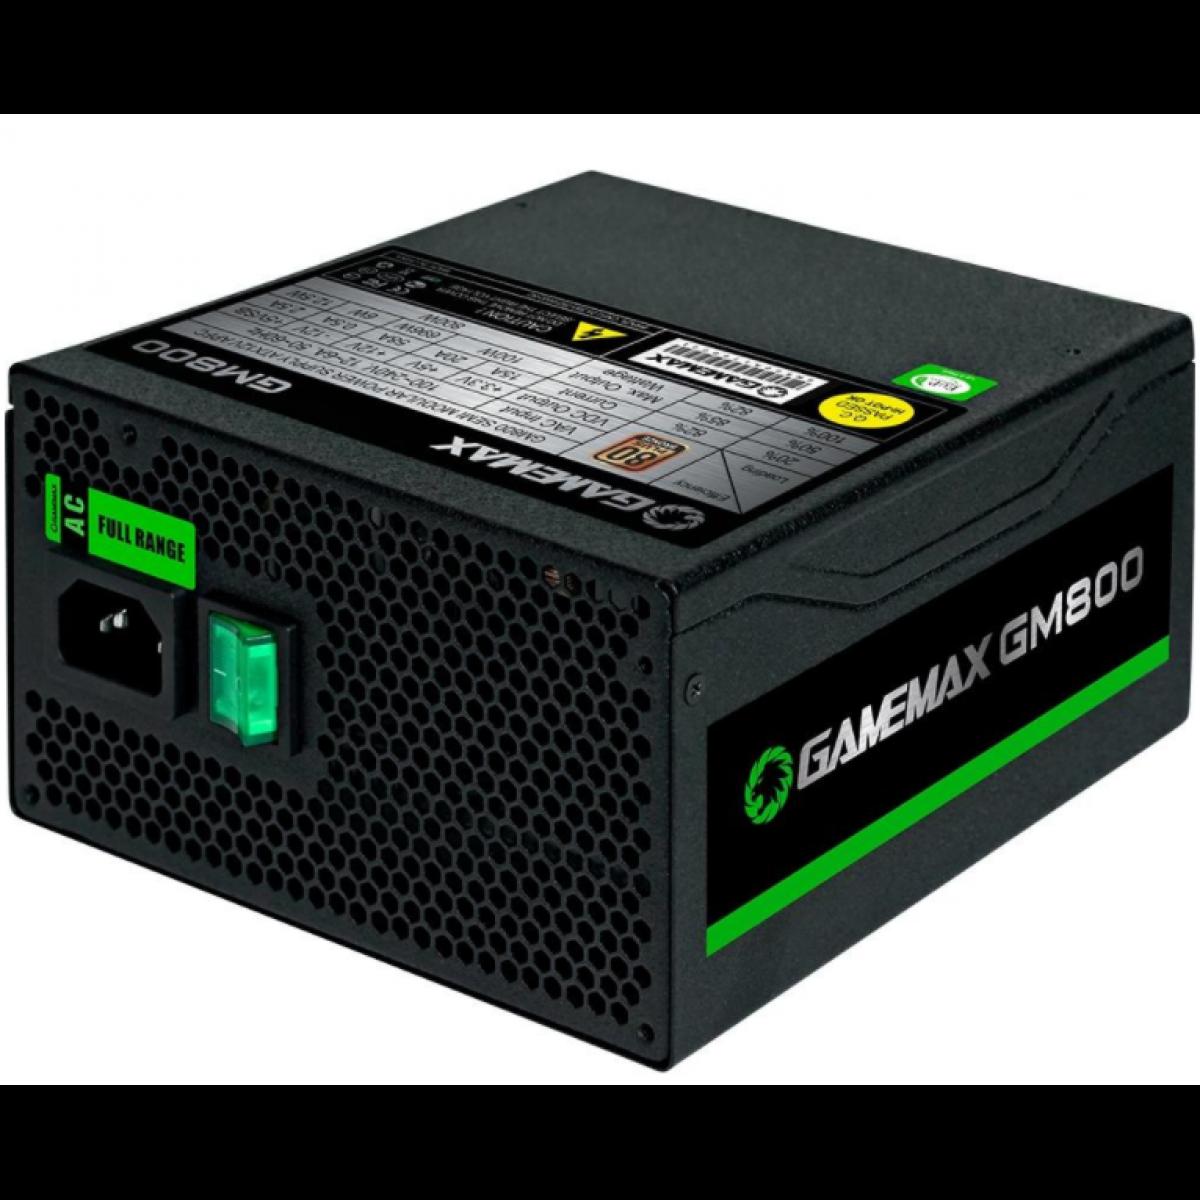 Fonte Gamemax GM800 800W, 80 Plus Bronze, PFC Ativo, Black